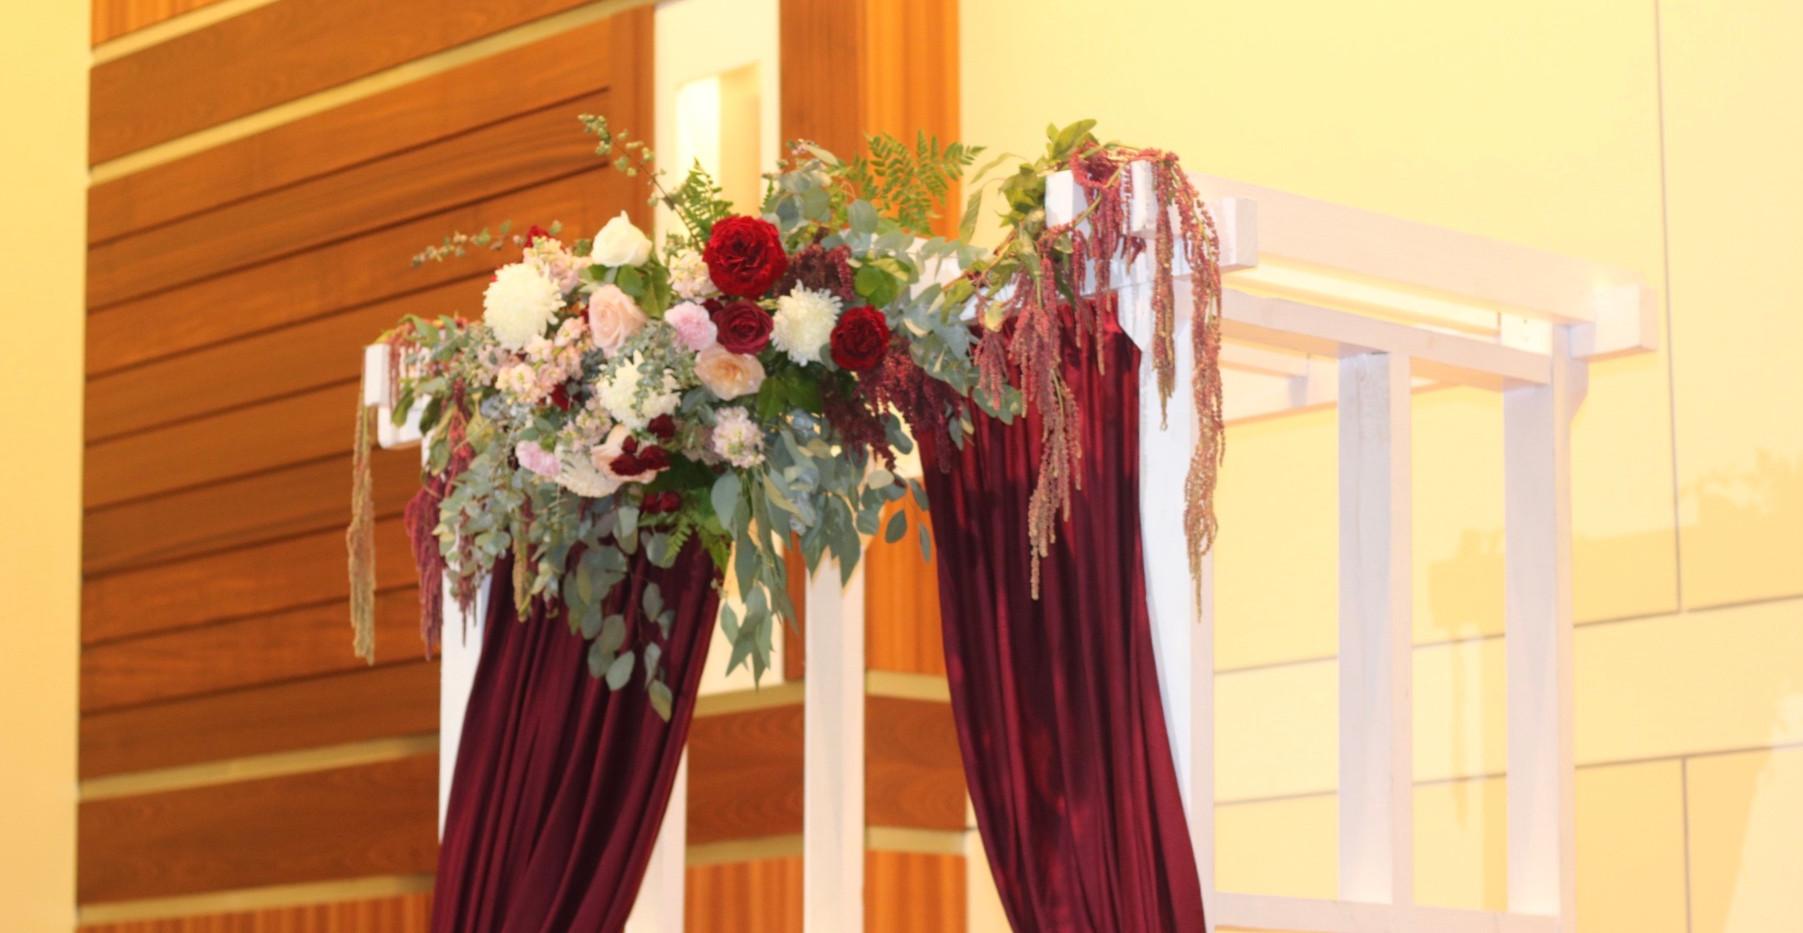 Filegebi's Wedding